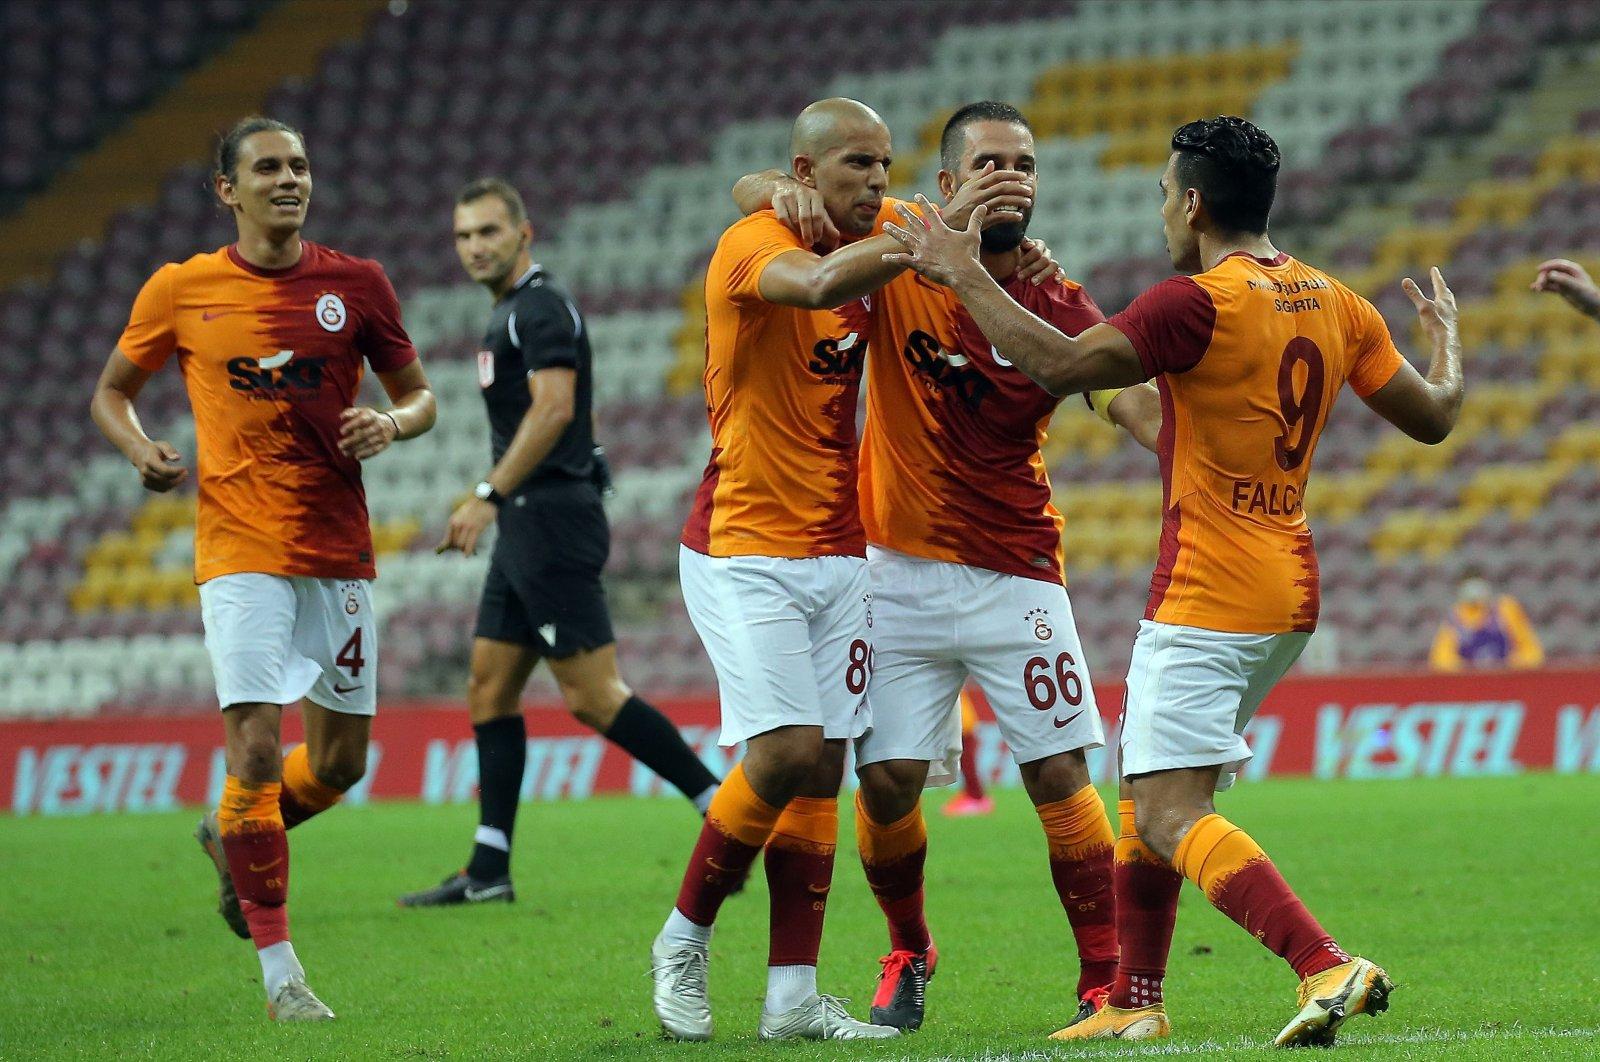 Galatasaray players celebrate a goal during a Süper Lig match against Gaziantep, in Istanbul, Turkey, Sept. 12, 2020. (IHA Photo)